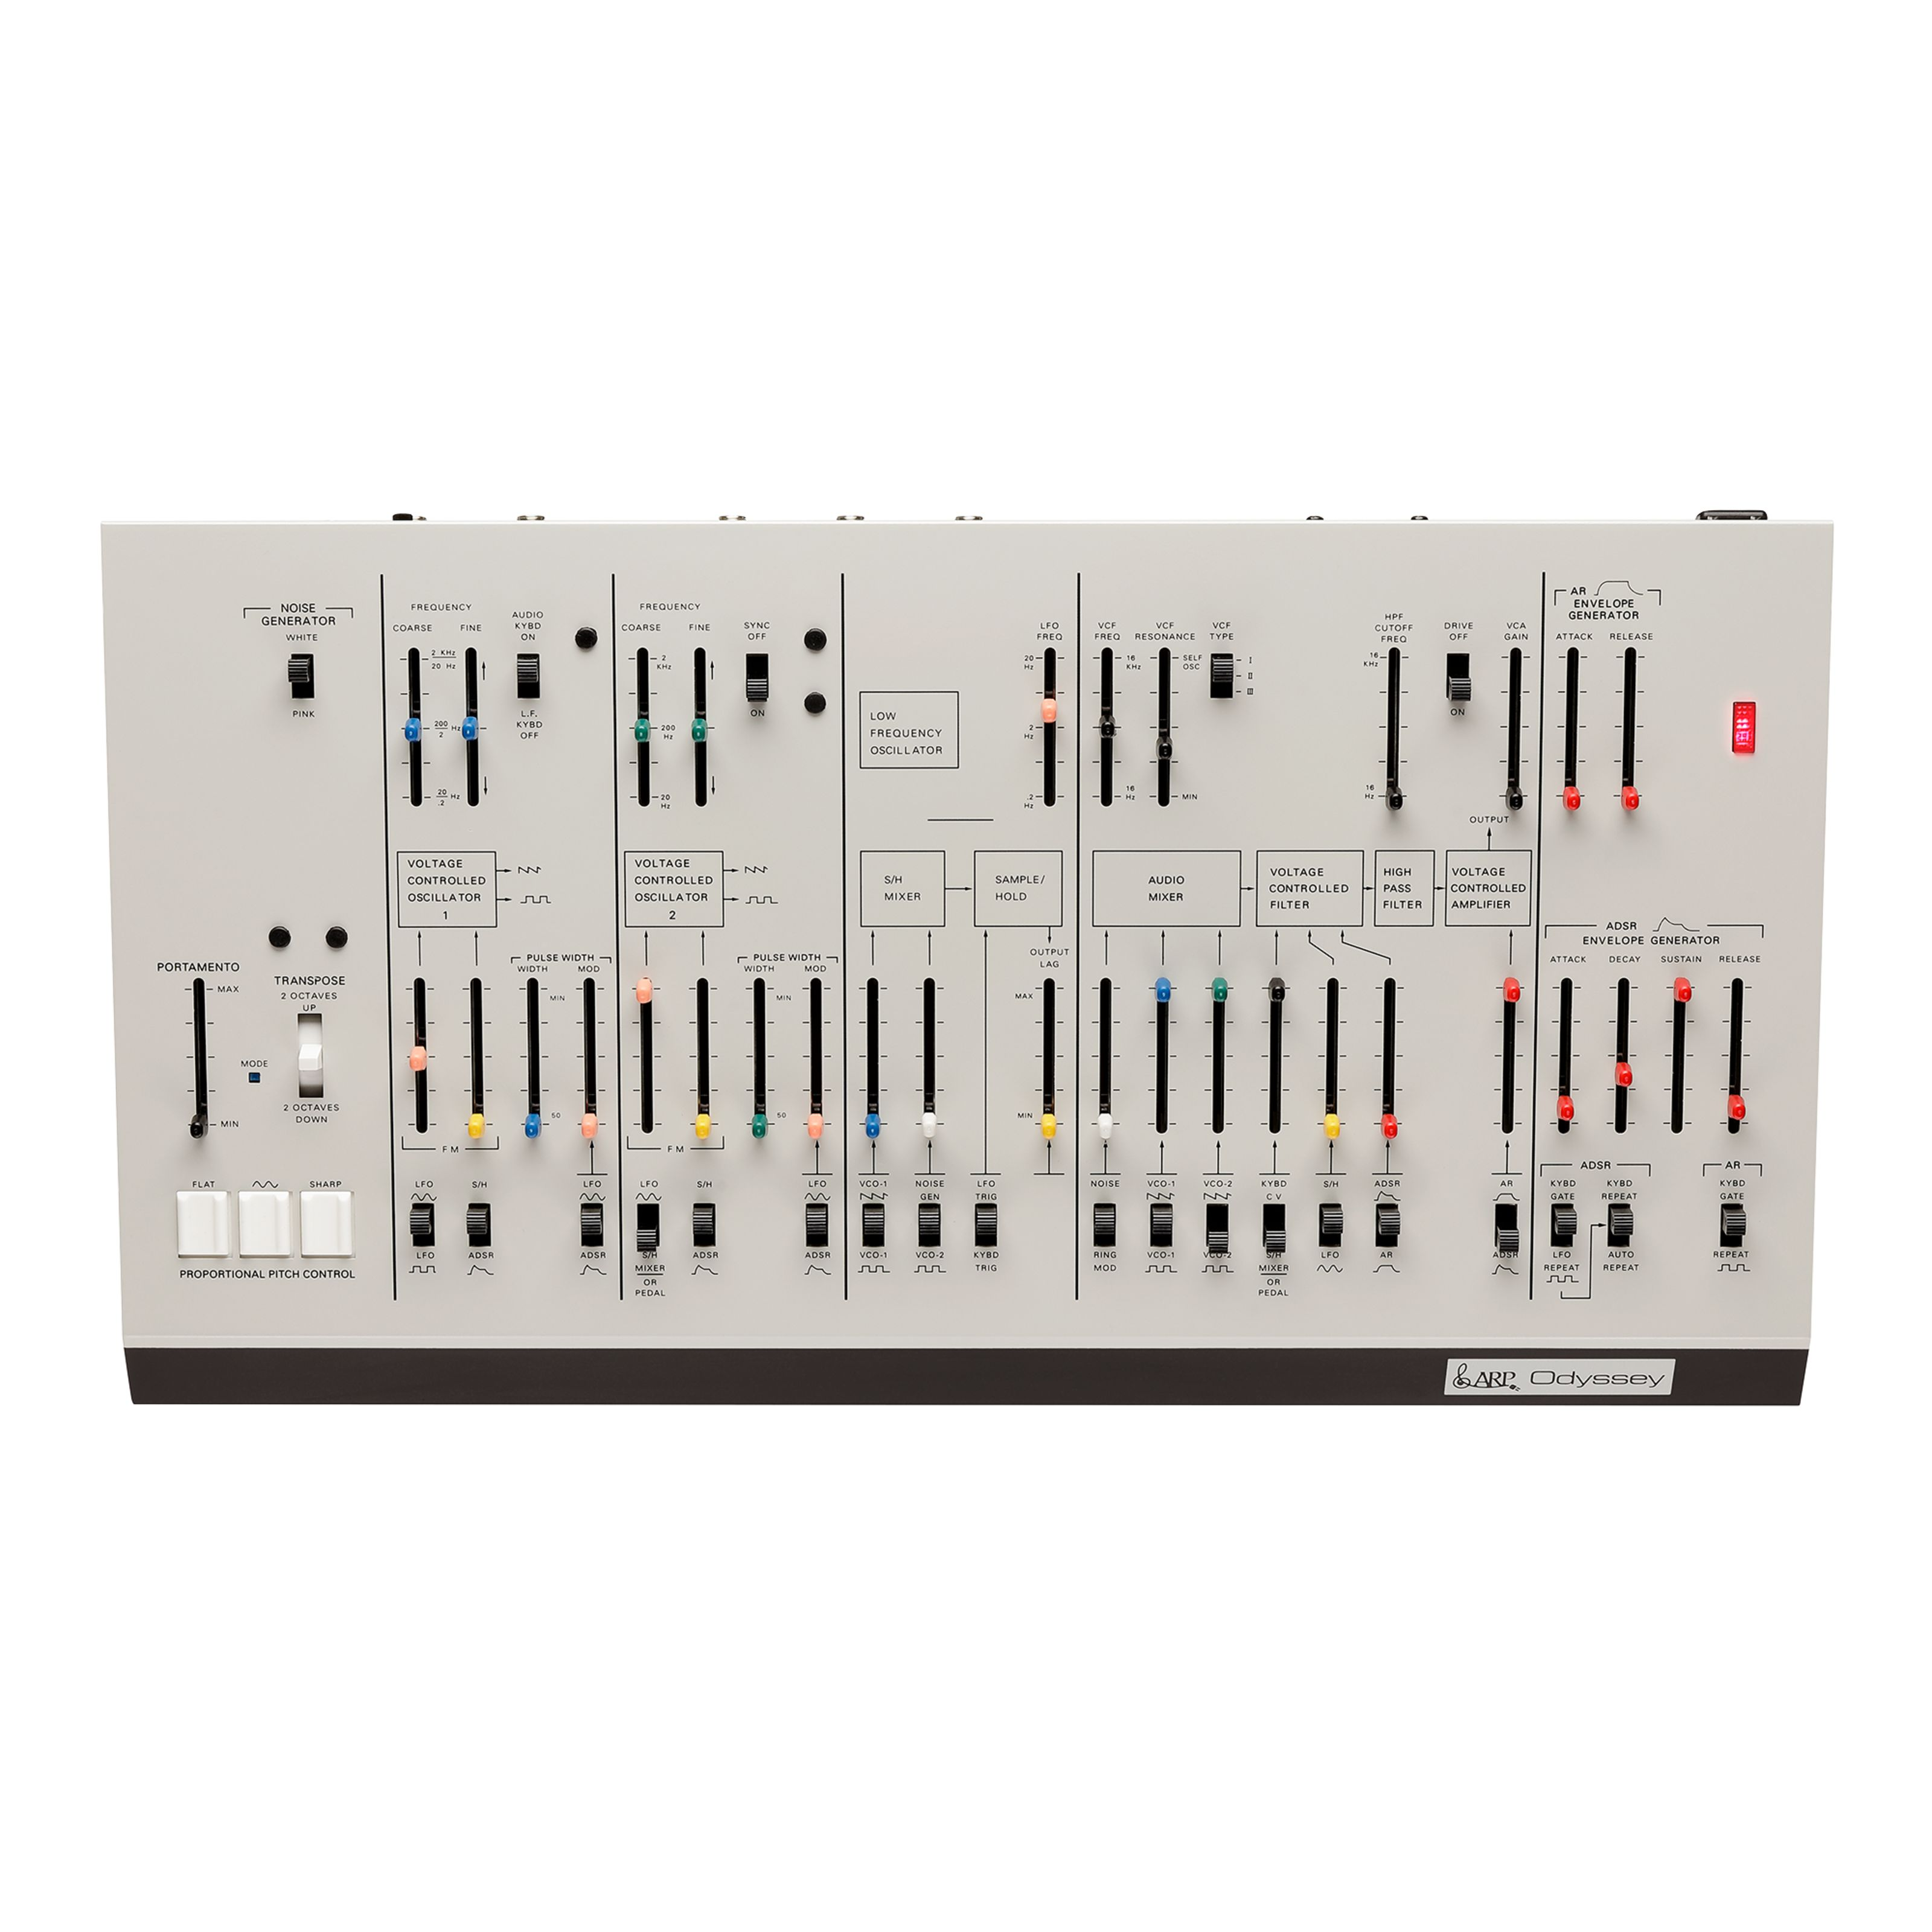 ARP - Odyssey Modul Rev. 1